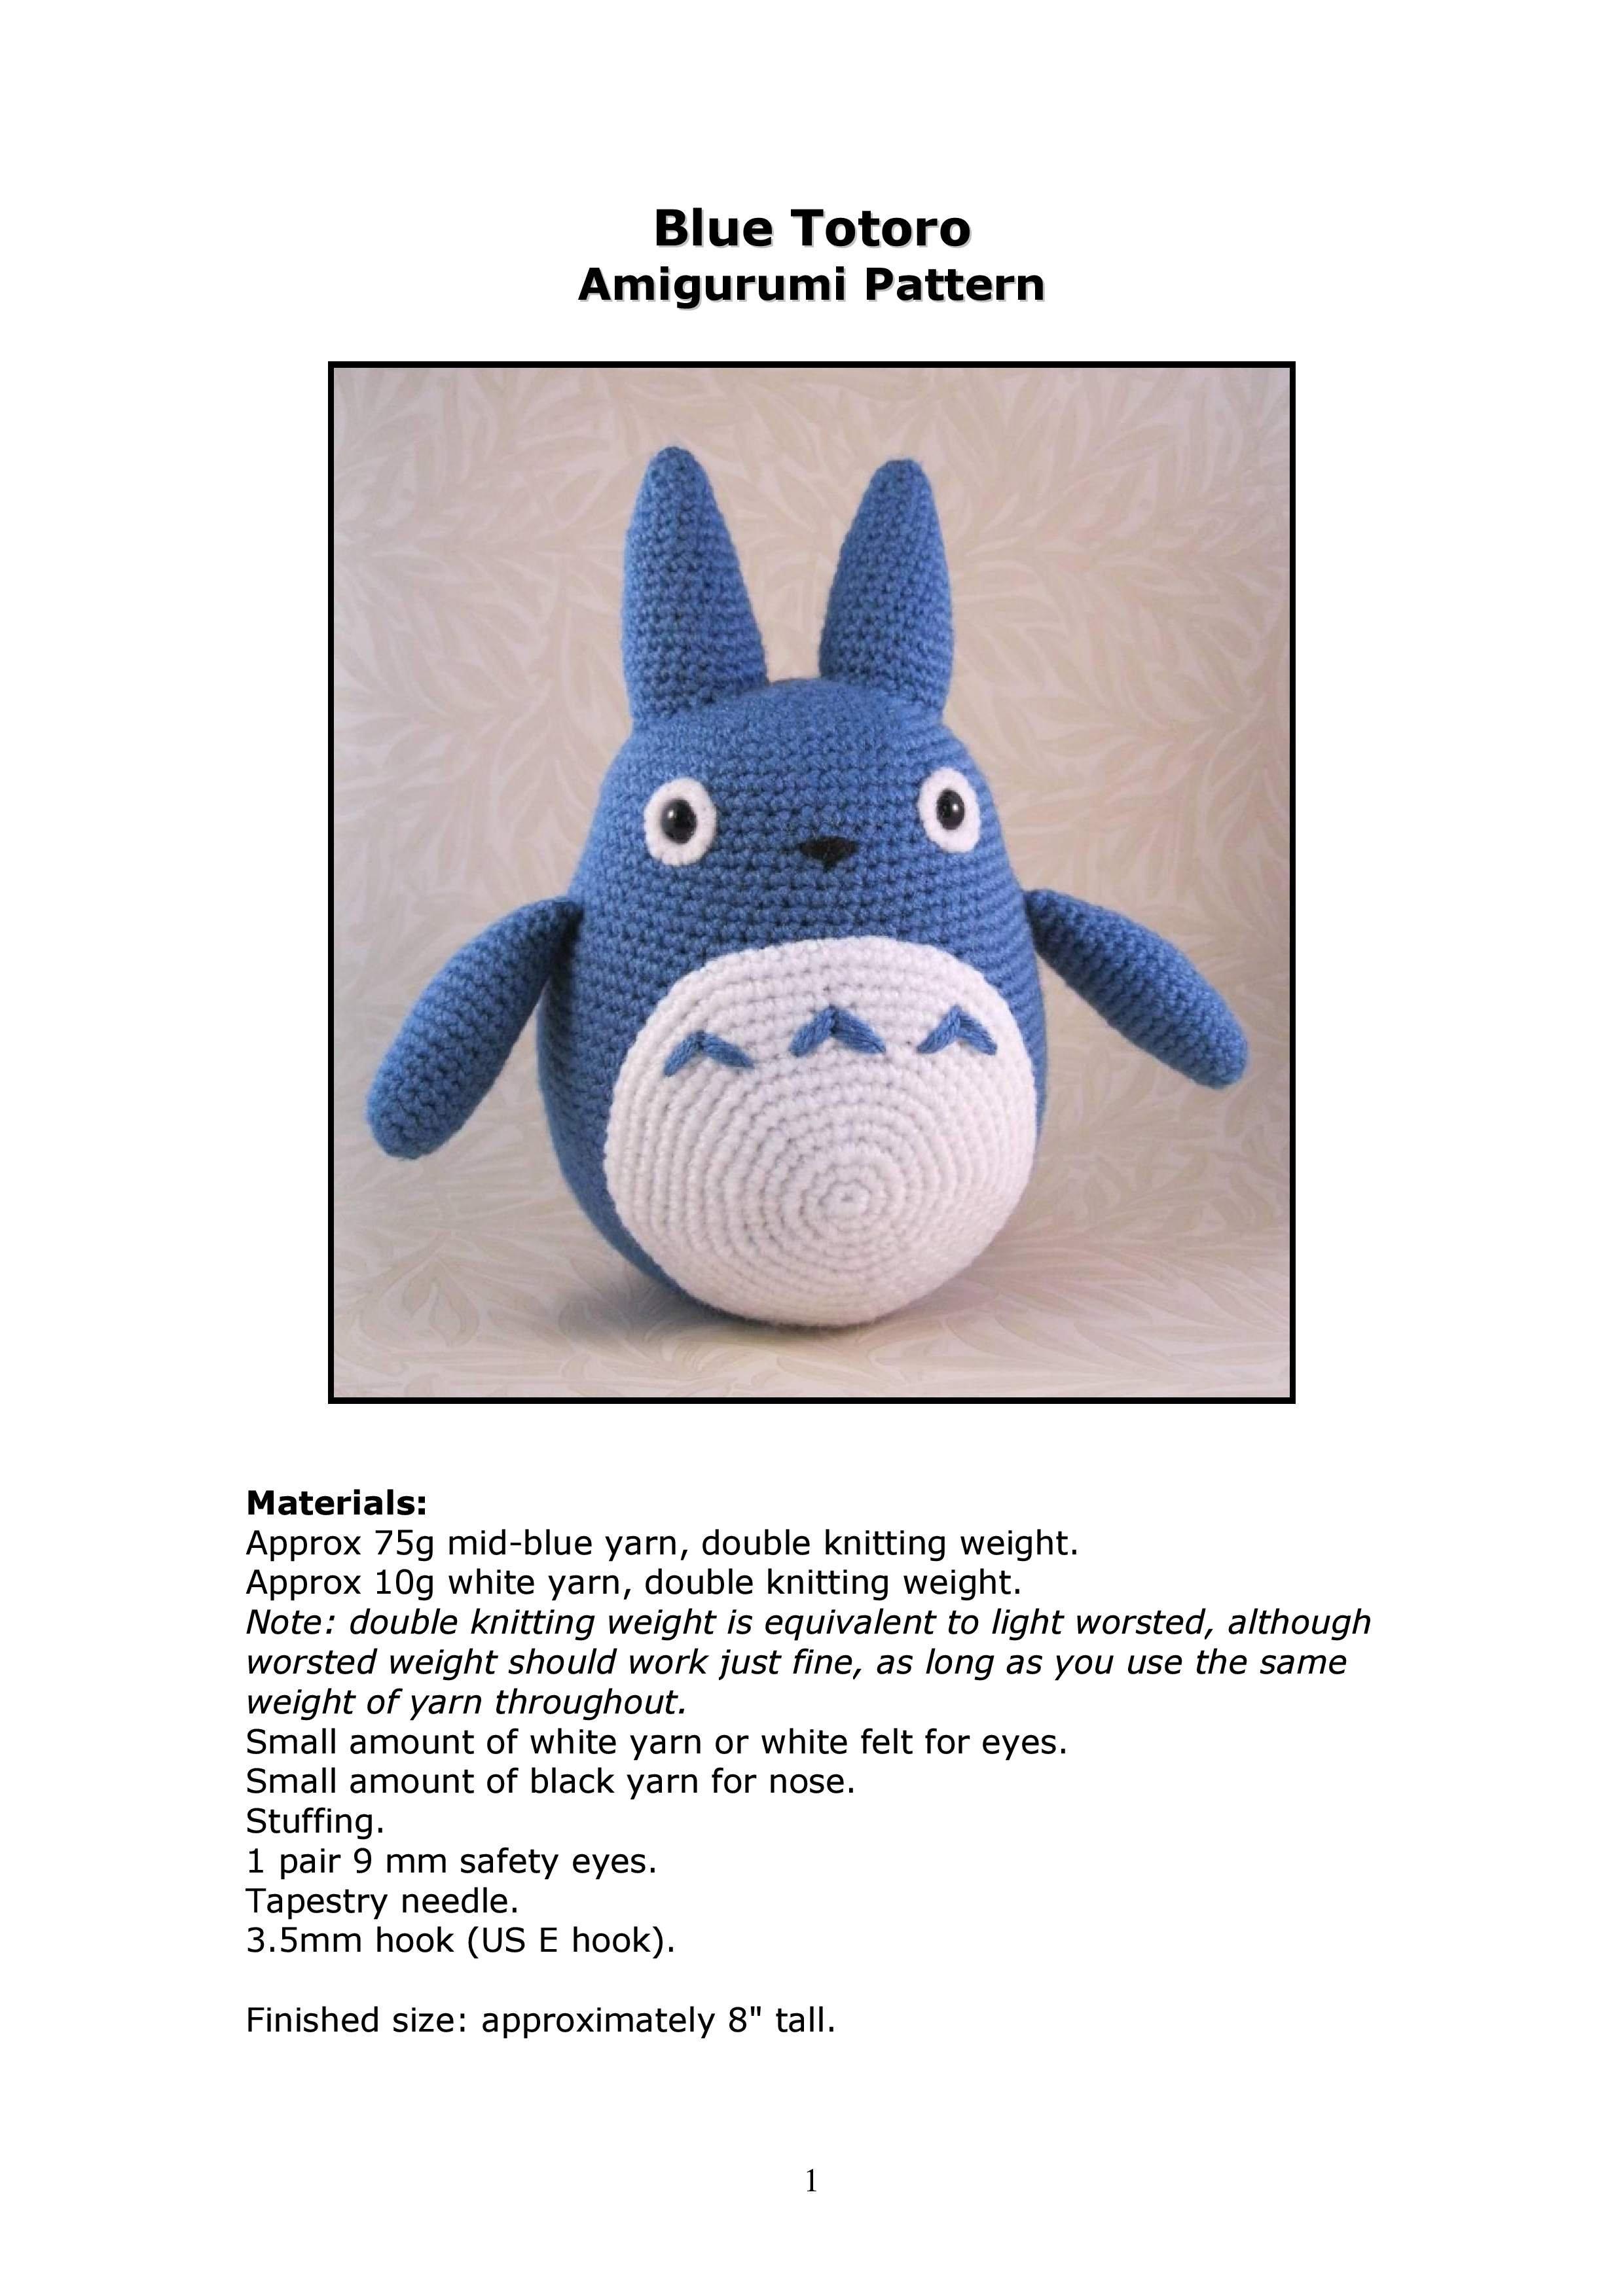 Totoro__Blue_Totoro_Amigurumi_Pattern1.jpg